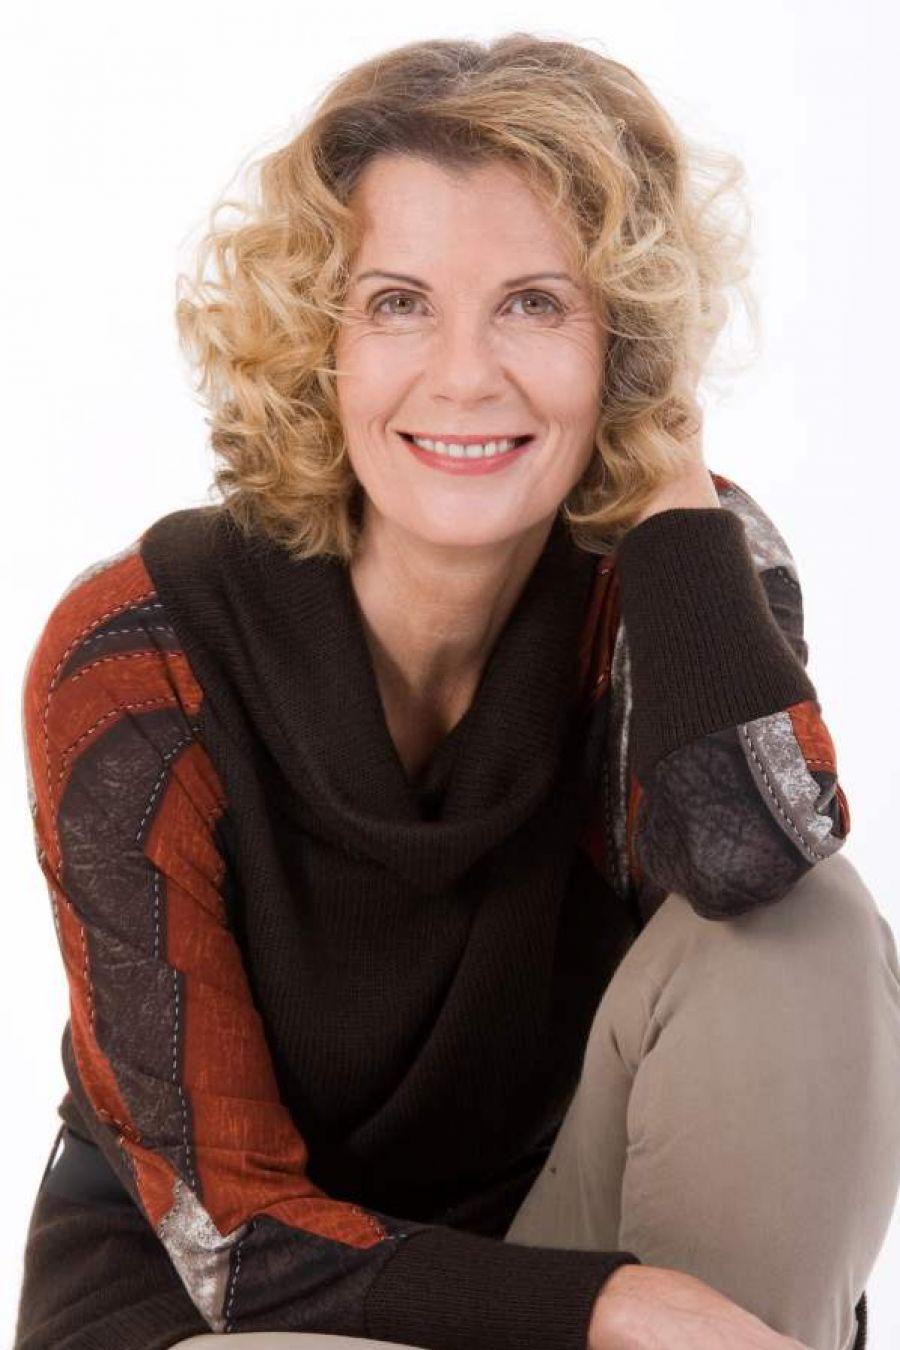 Medium Hair Women Over 50